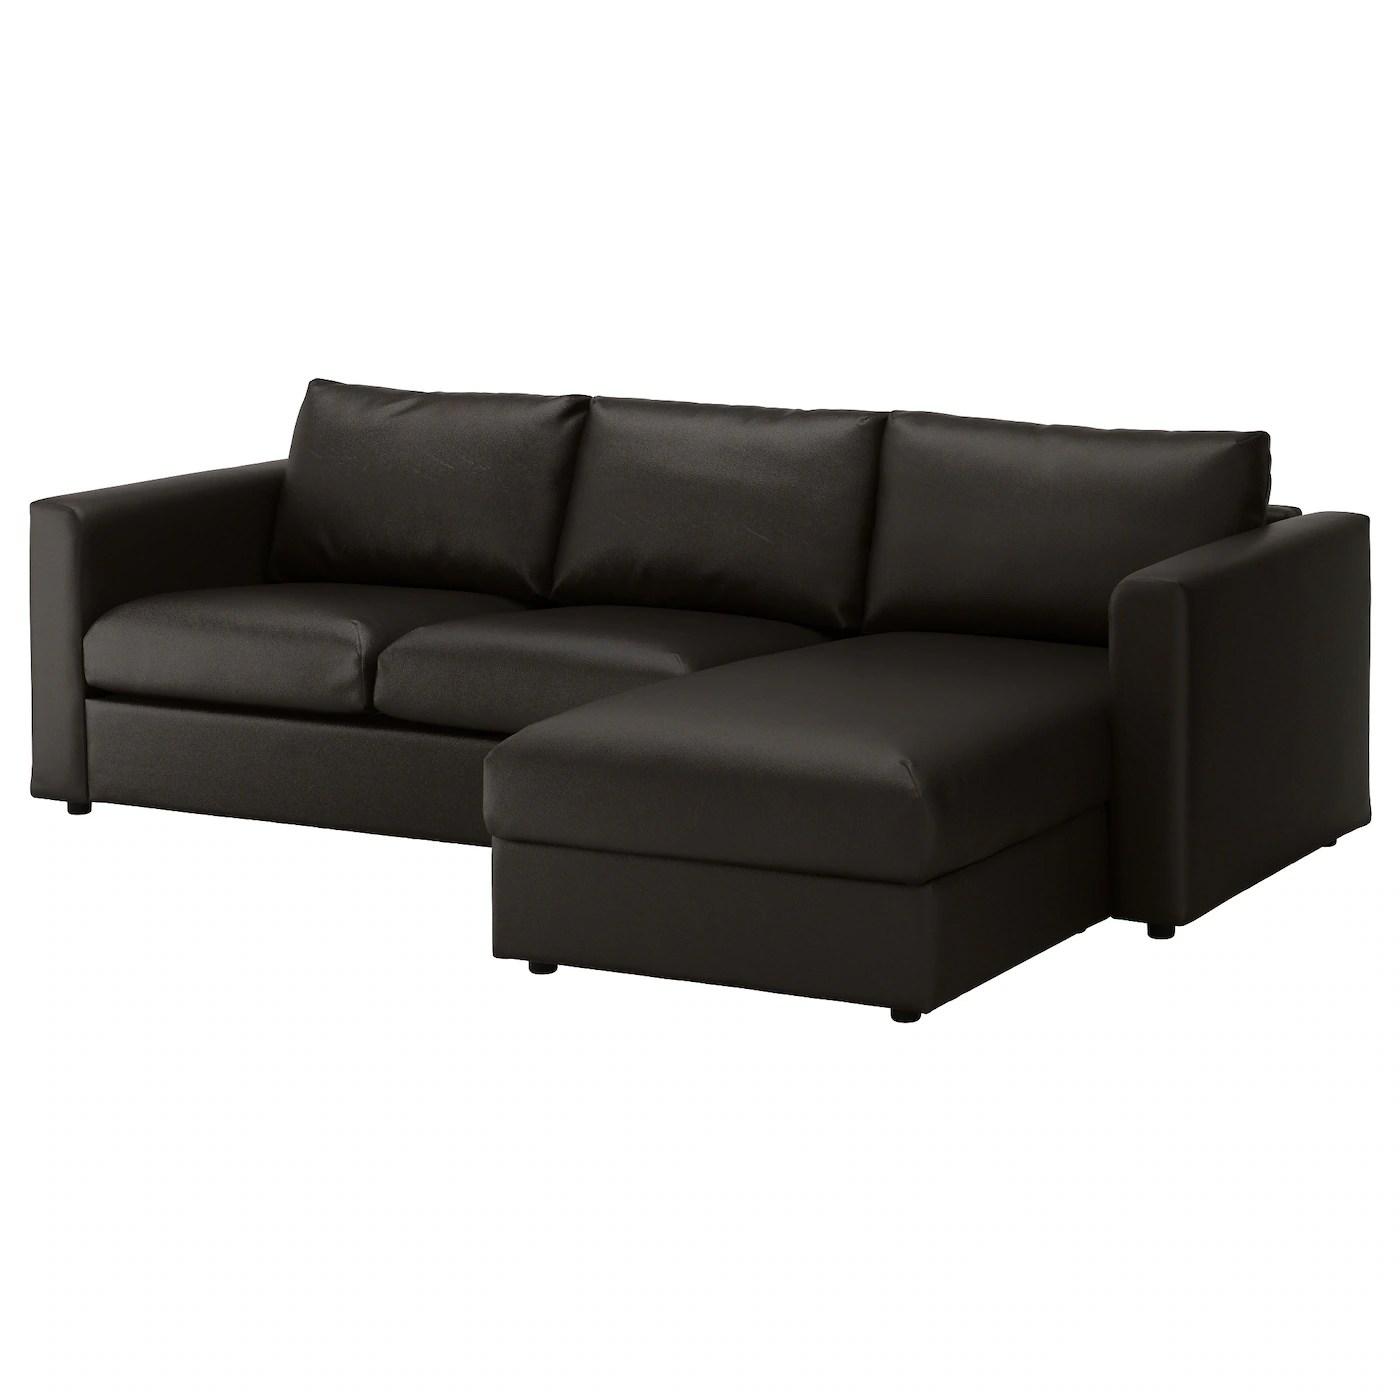 clean leather sofa with damp cloth single seater chair india vimle 3 seat chaise longue farsta black ikea